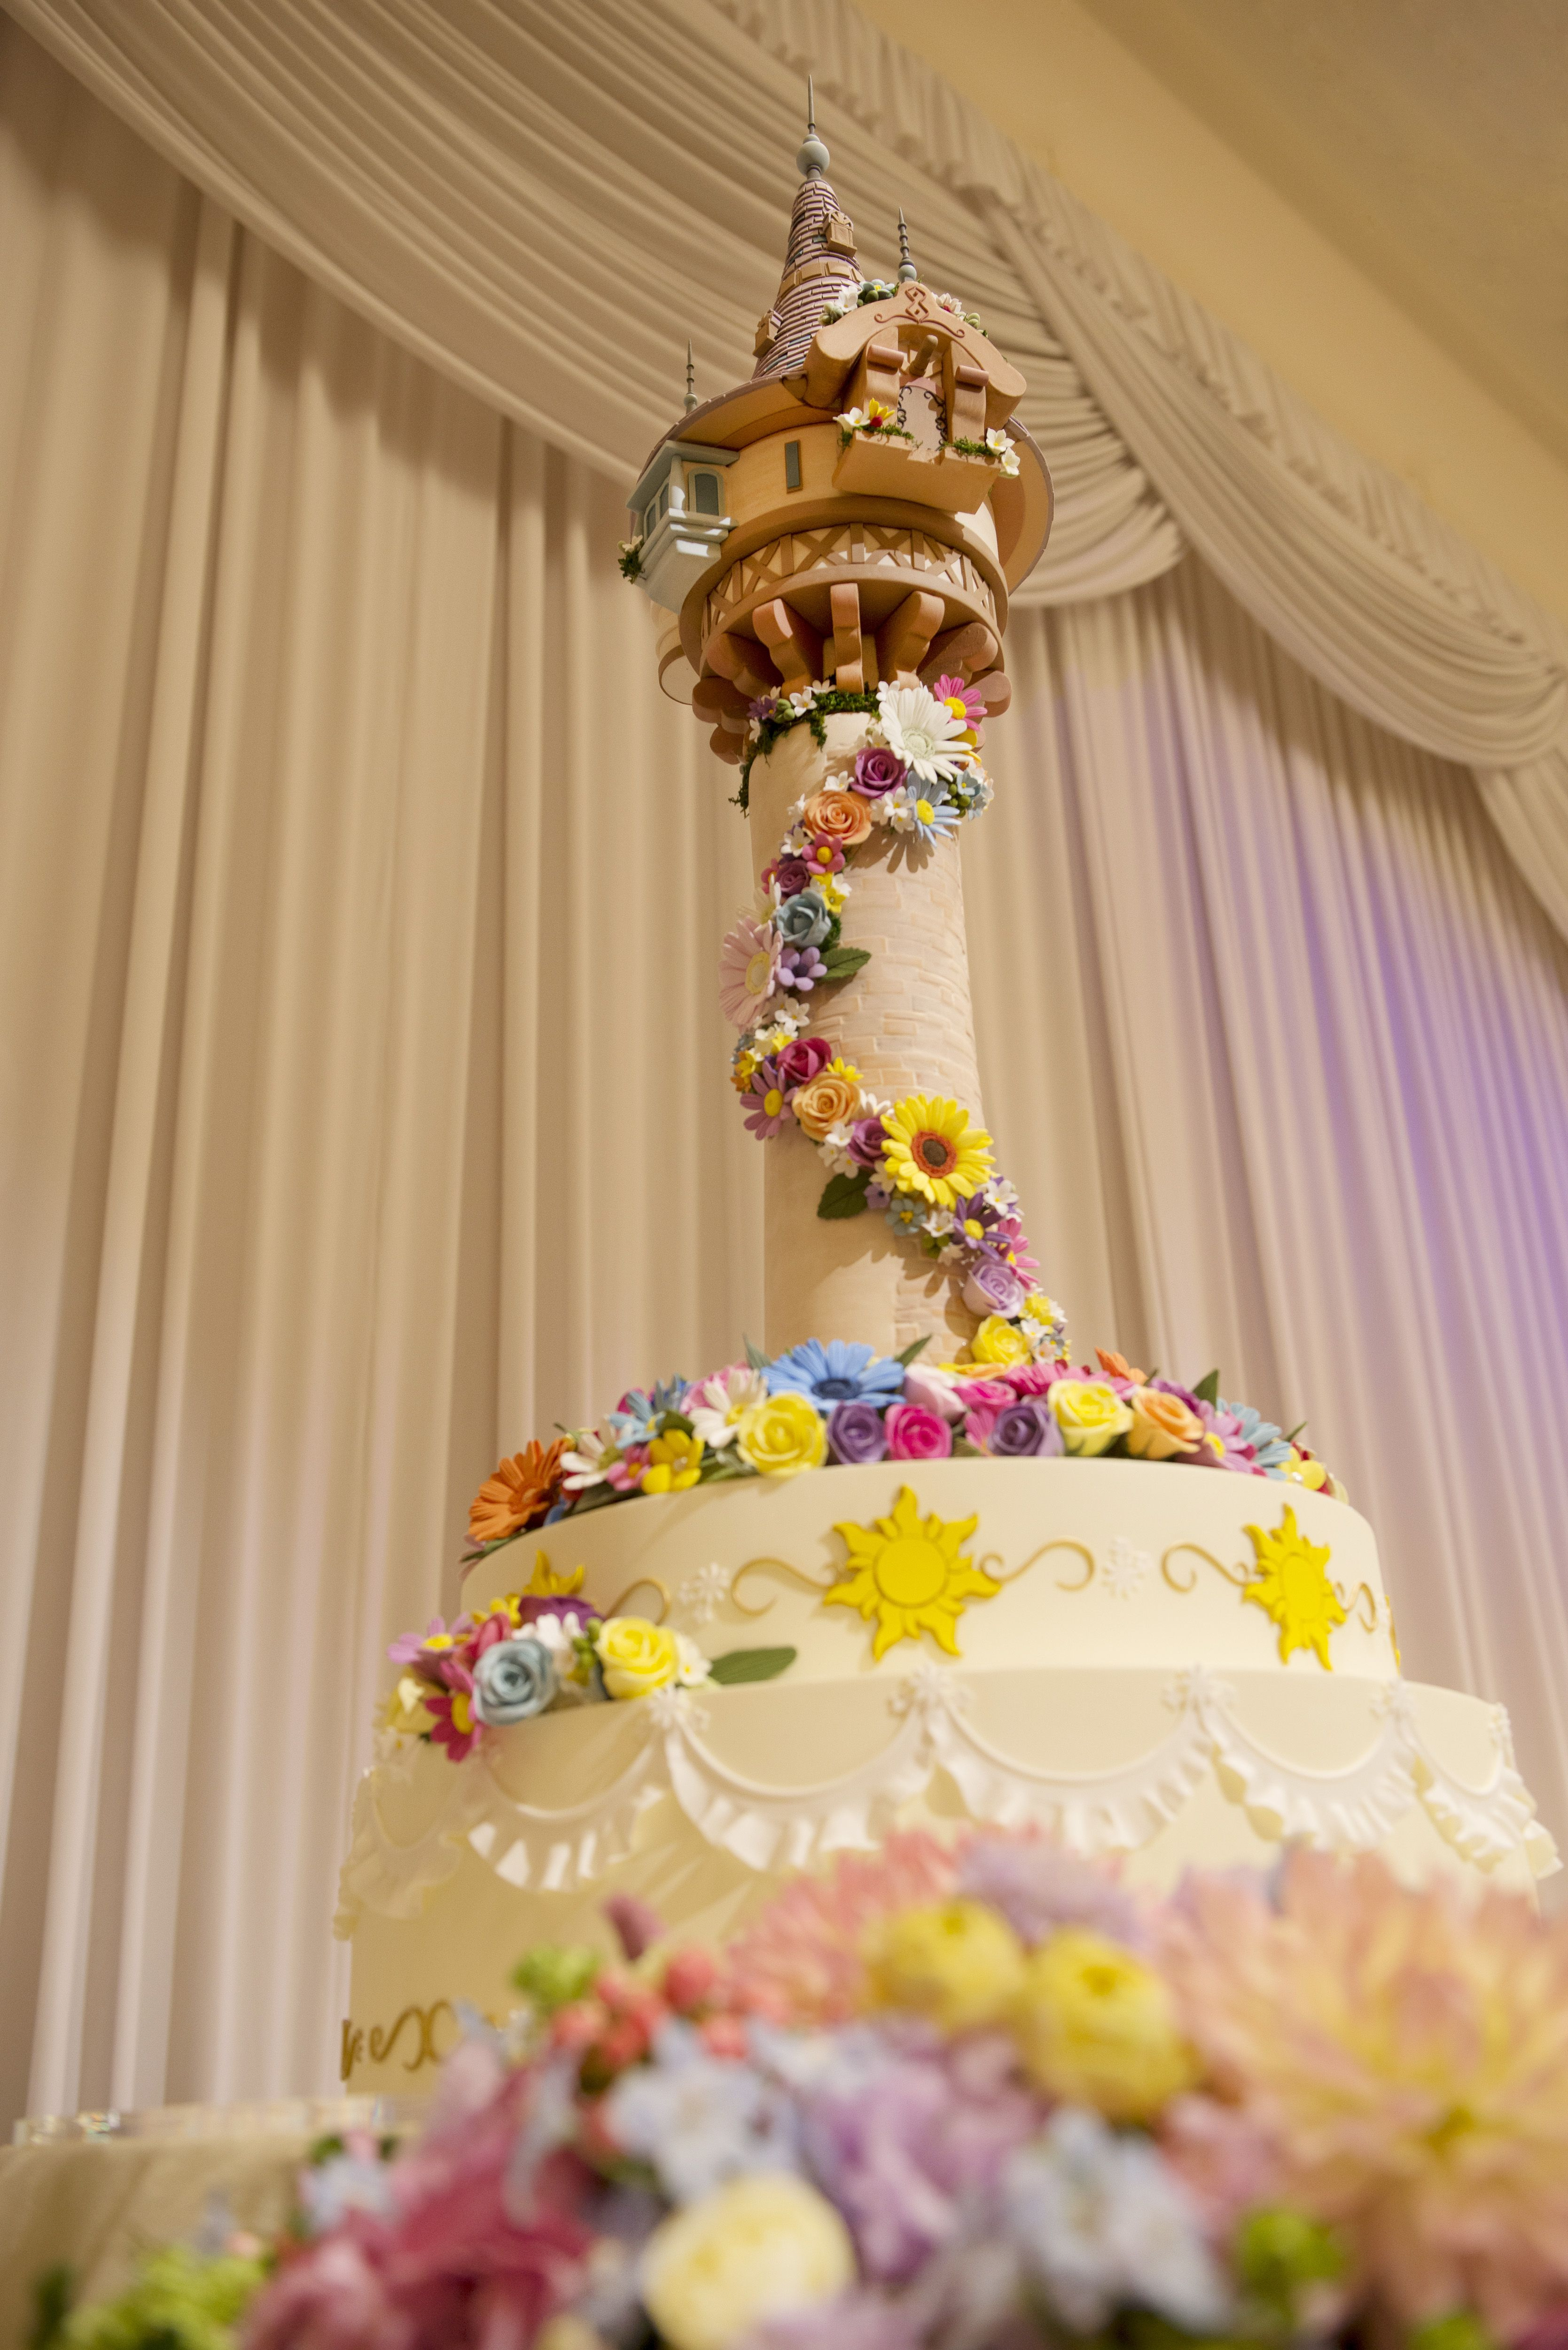 Pin by Sarah✌🏼 on Disney | Pinterest | Wedding cake inspiration ...